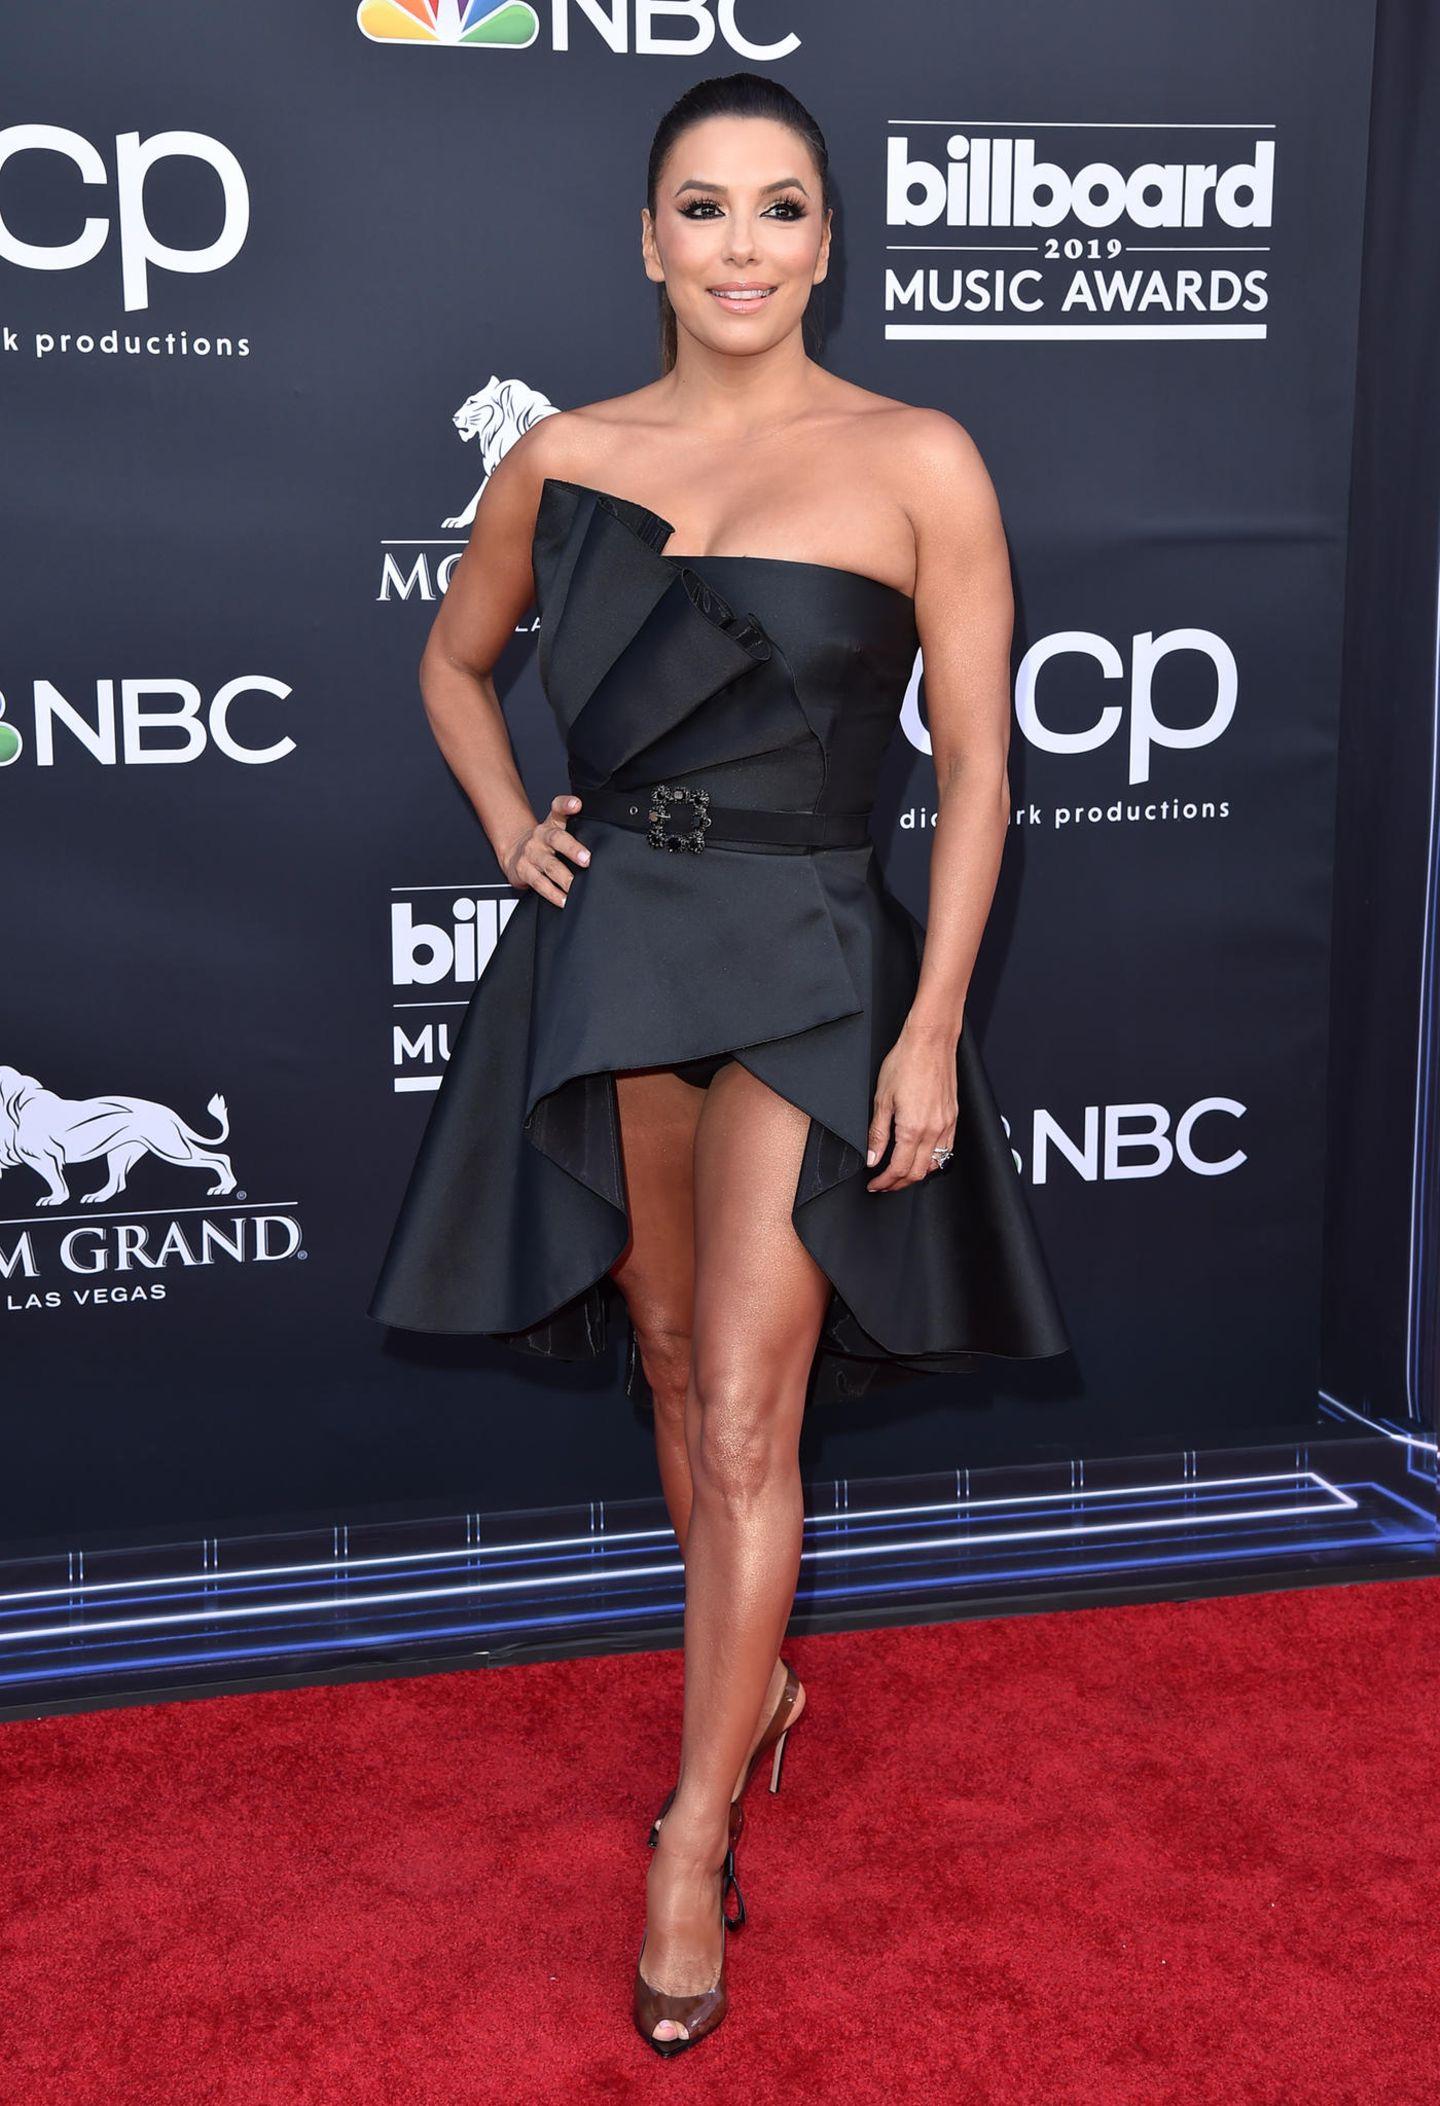 Eva Longoria bei den 2019 Billboard Music Awards mit Hosenblitzer